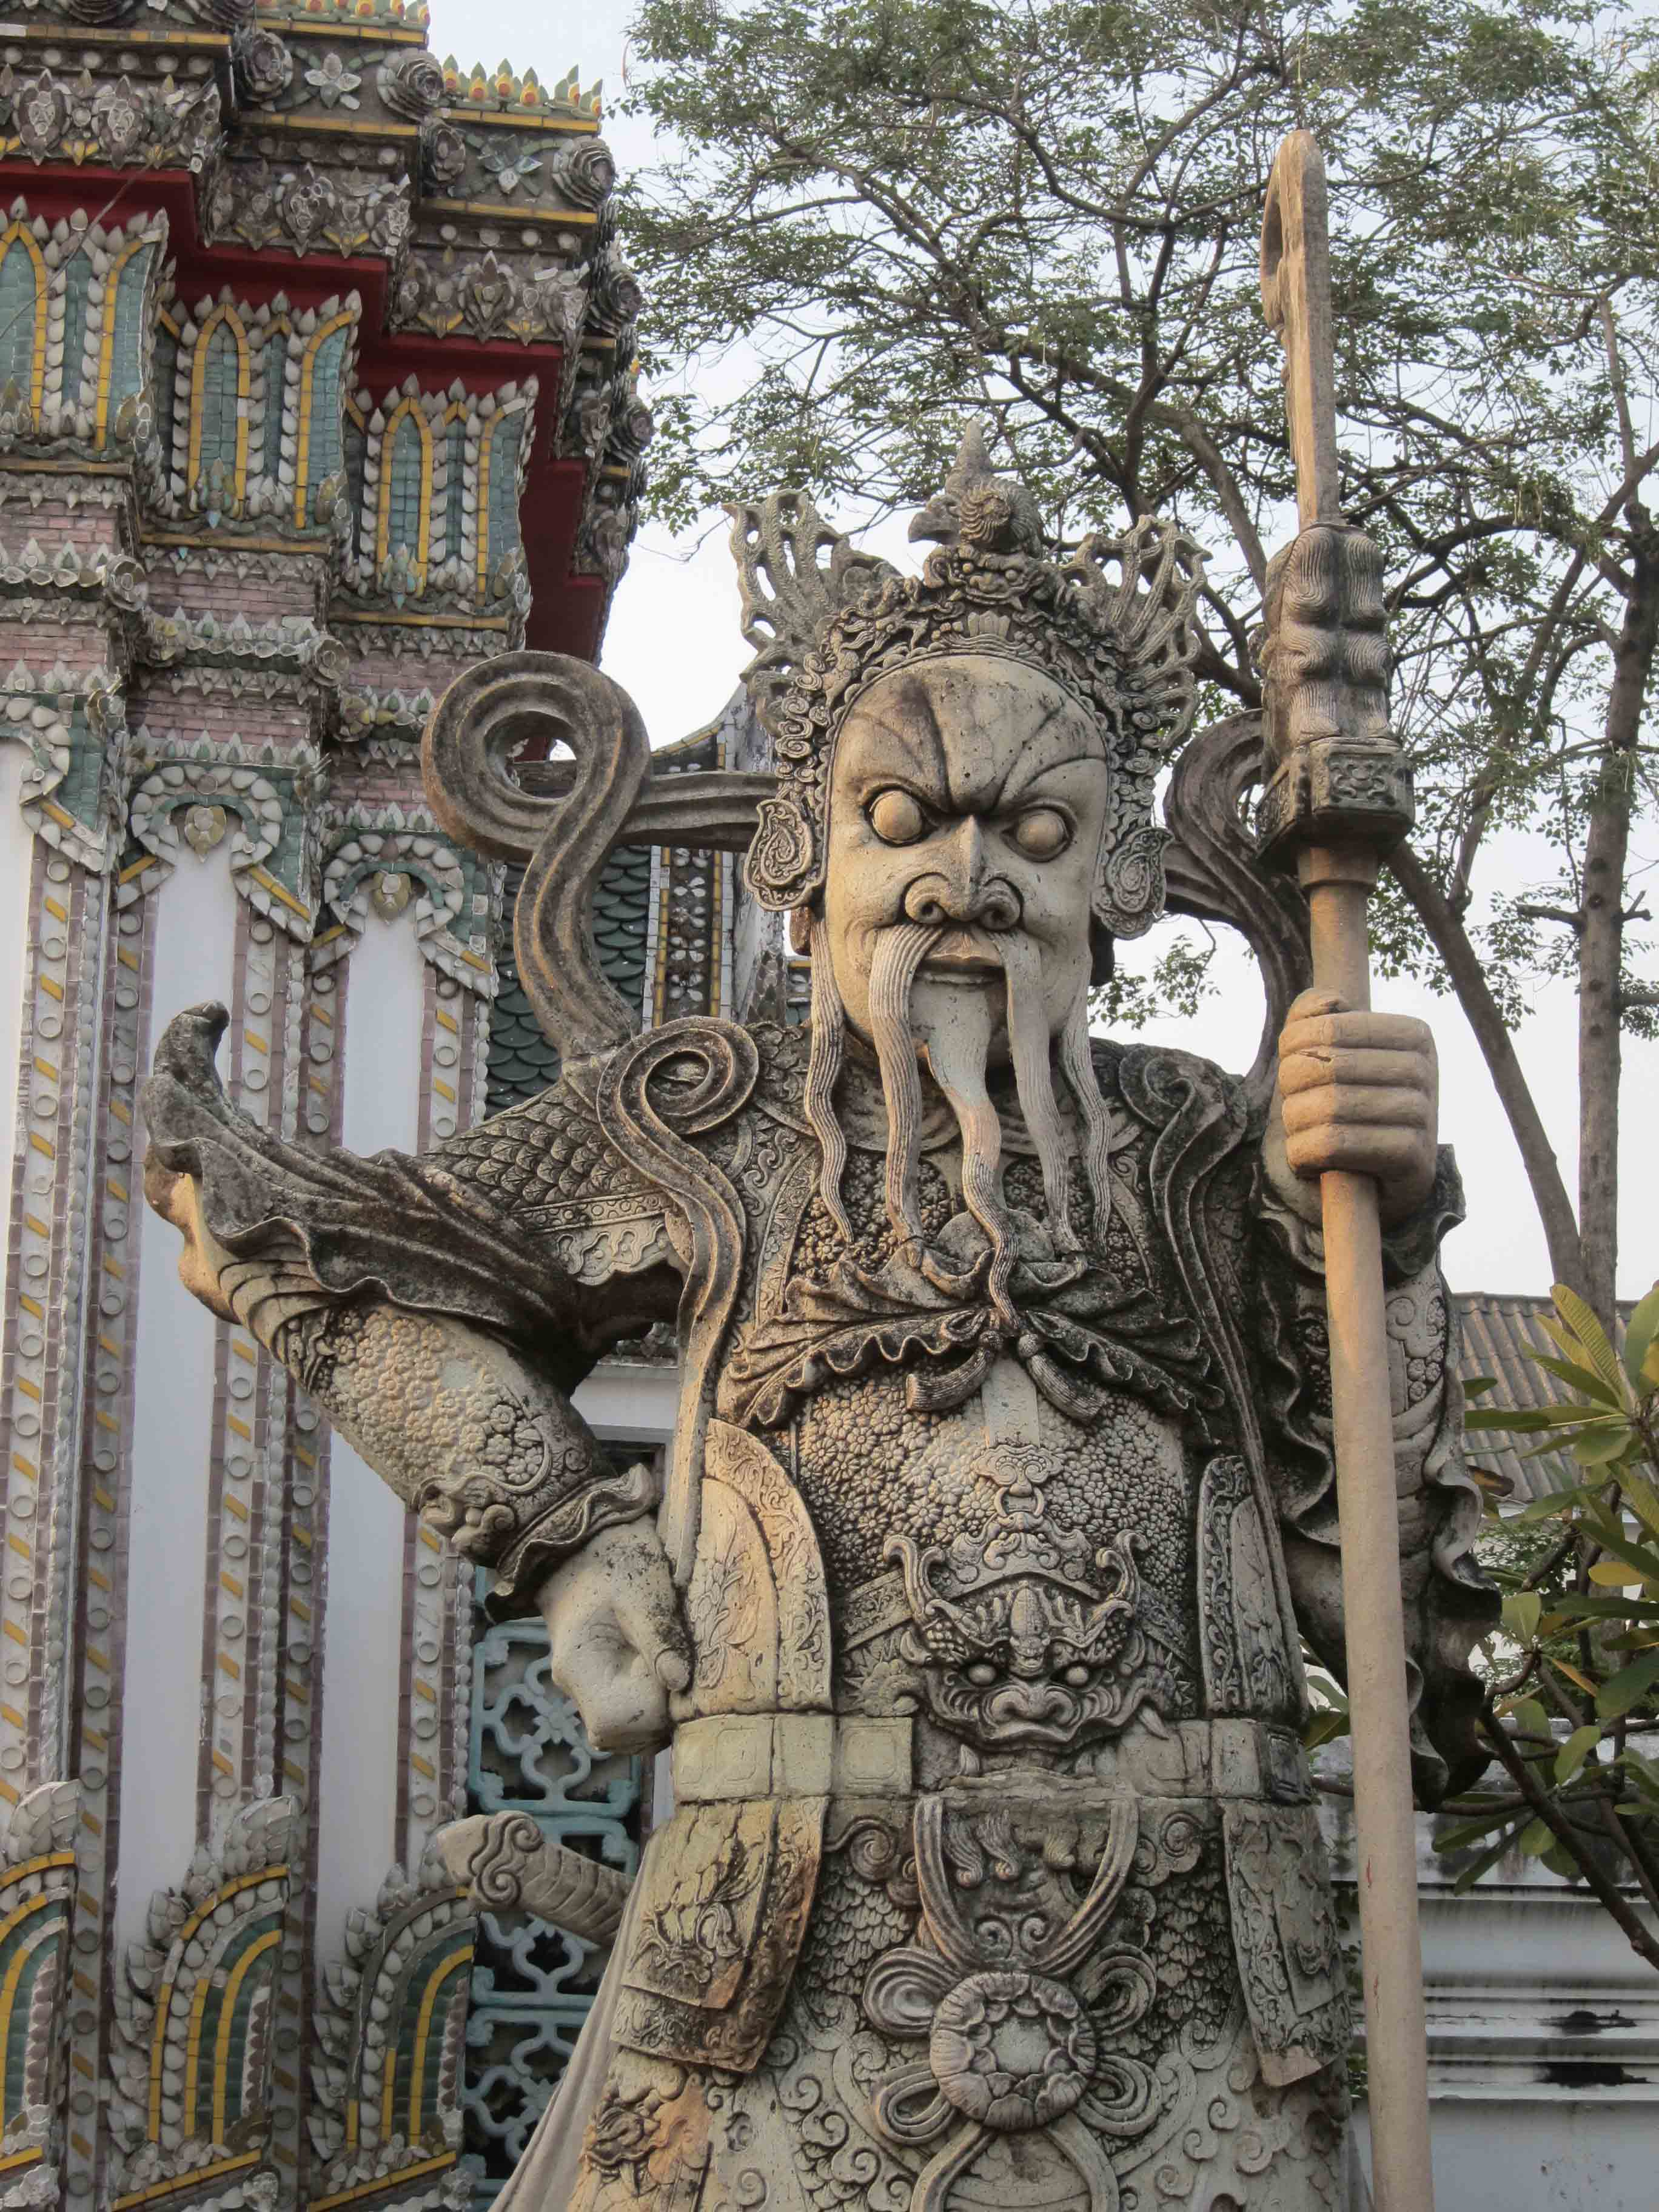 Sages-peuplent-le-temple-Wat-Pho-Bangkok-Thailande.jpg